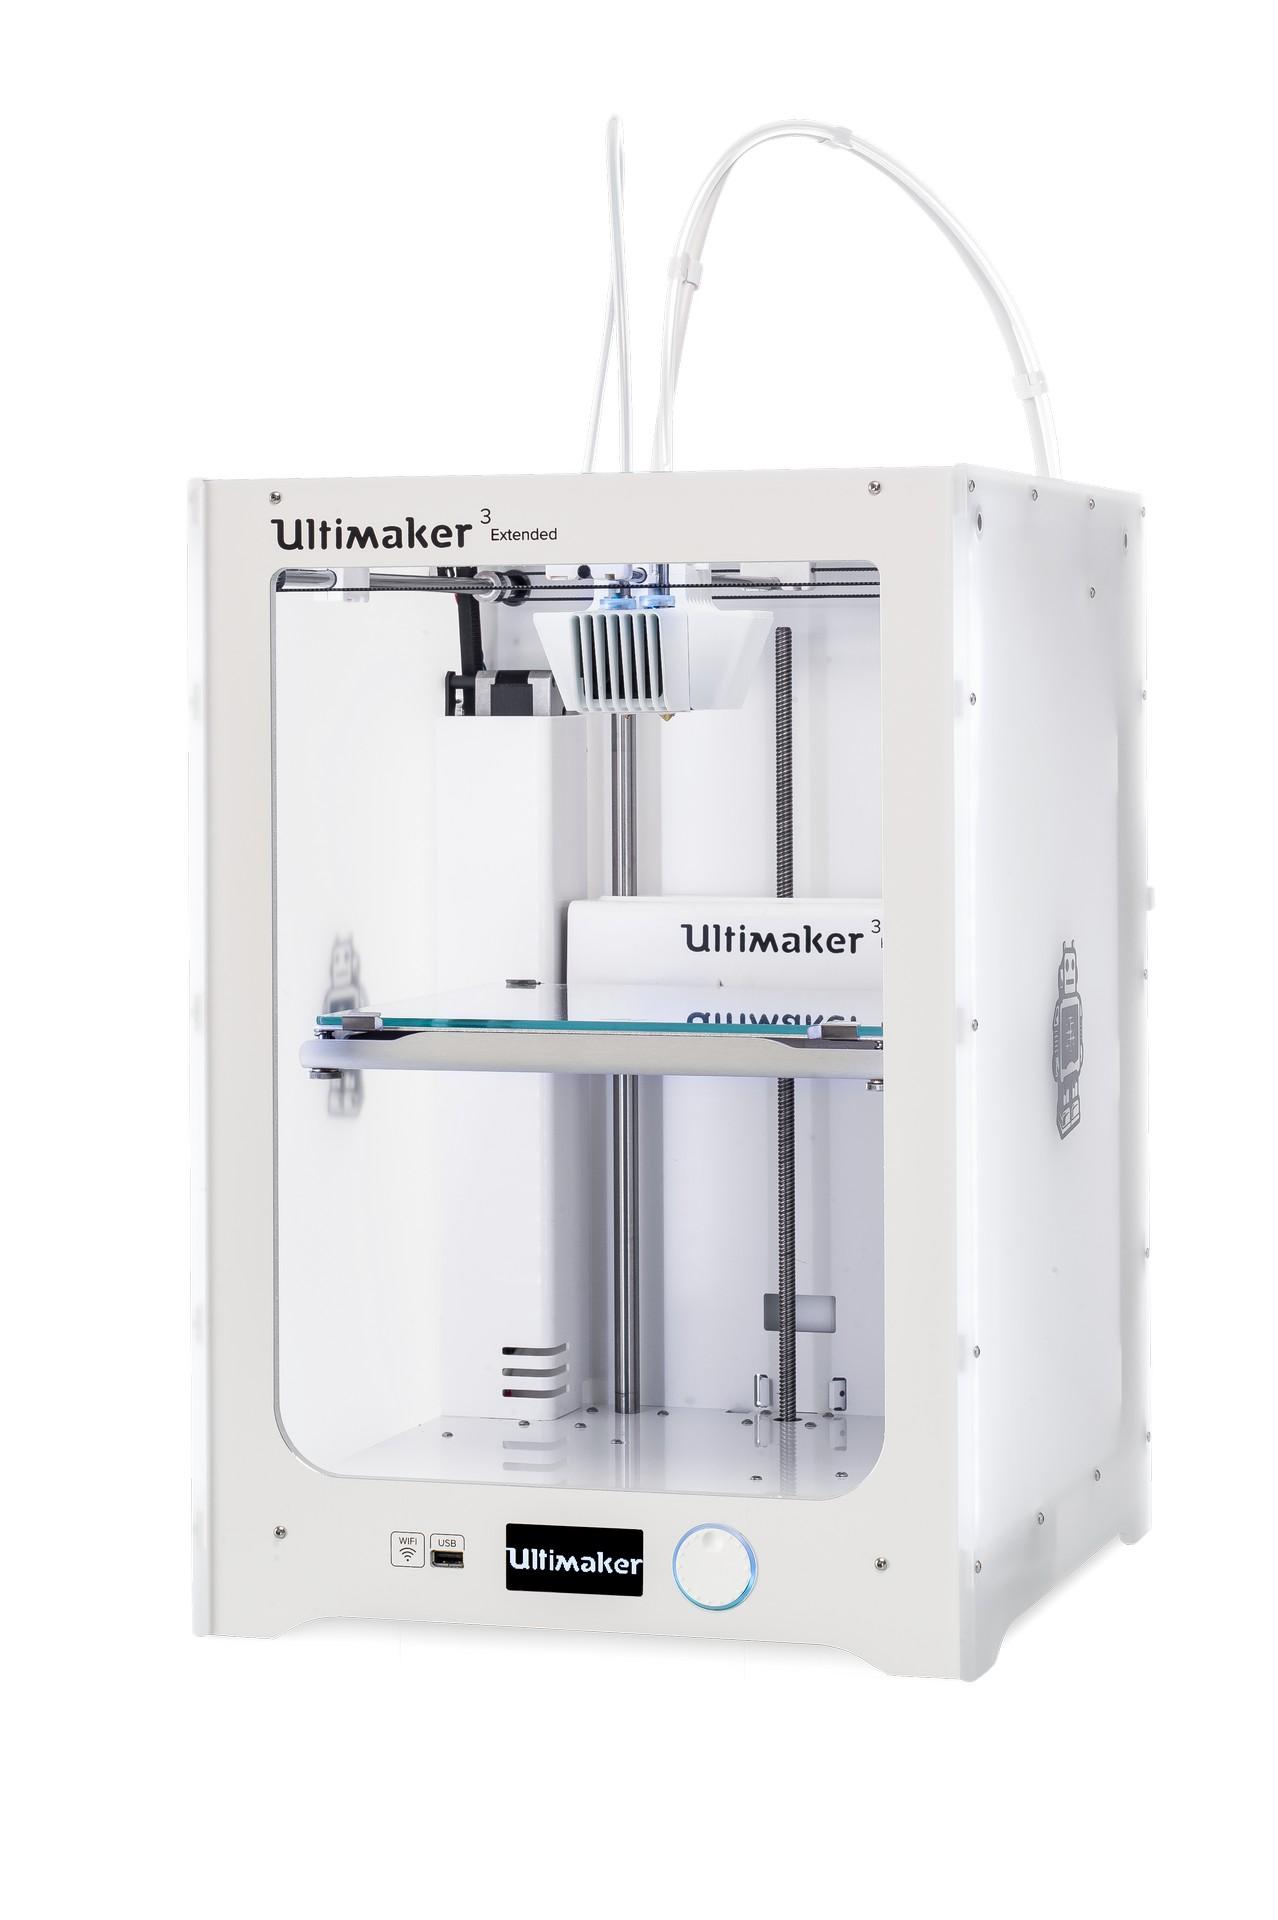 Ultimaker-3-Extended-3